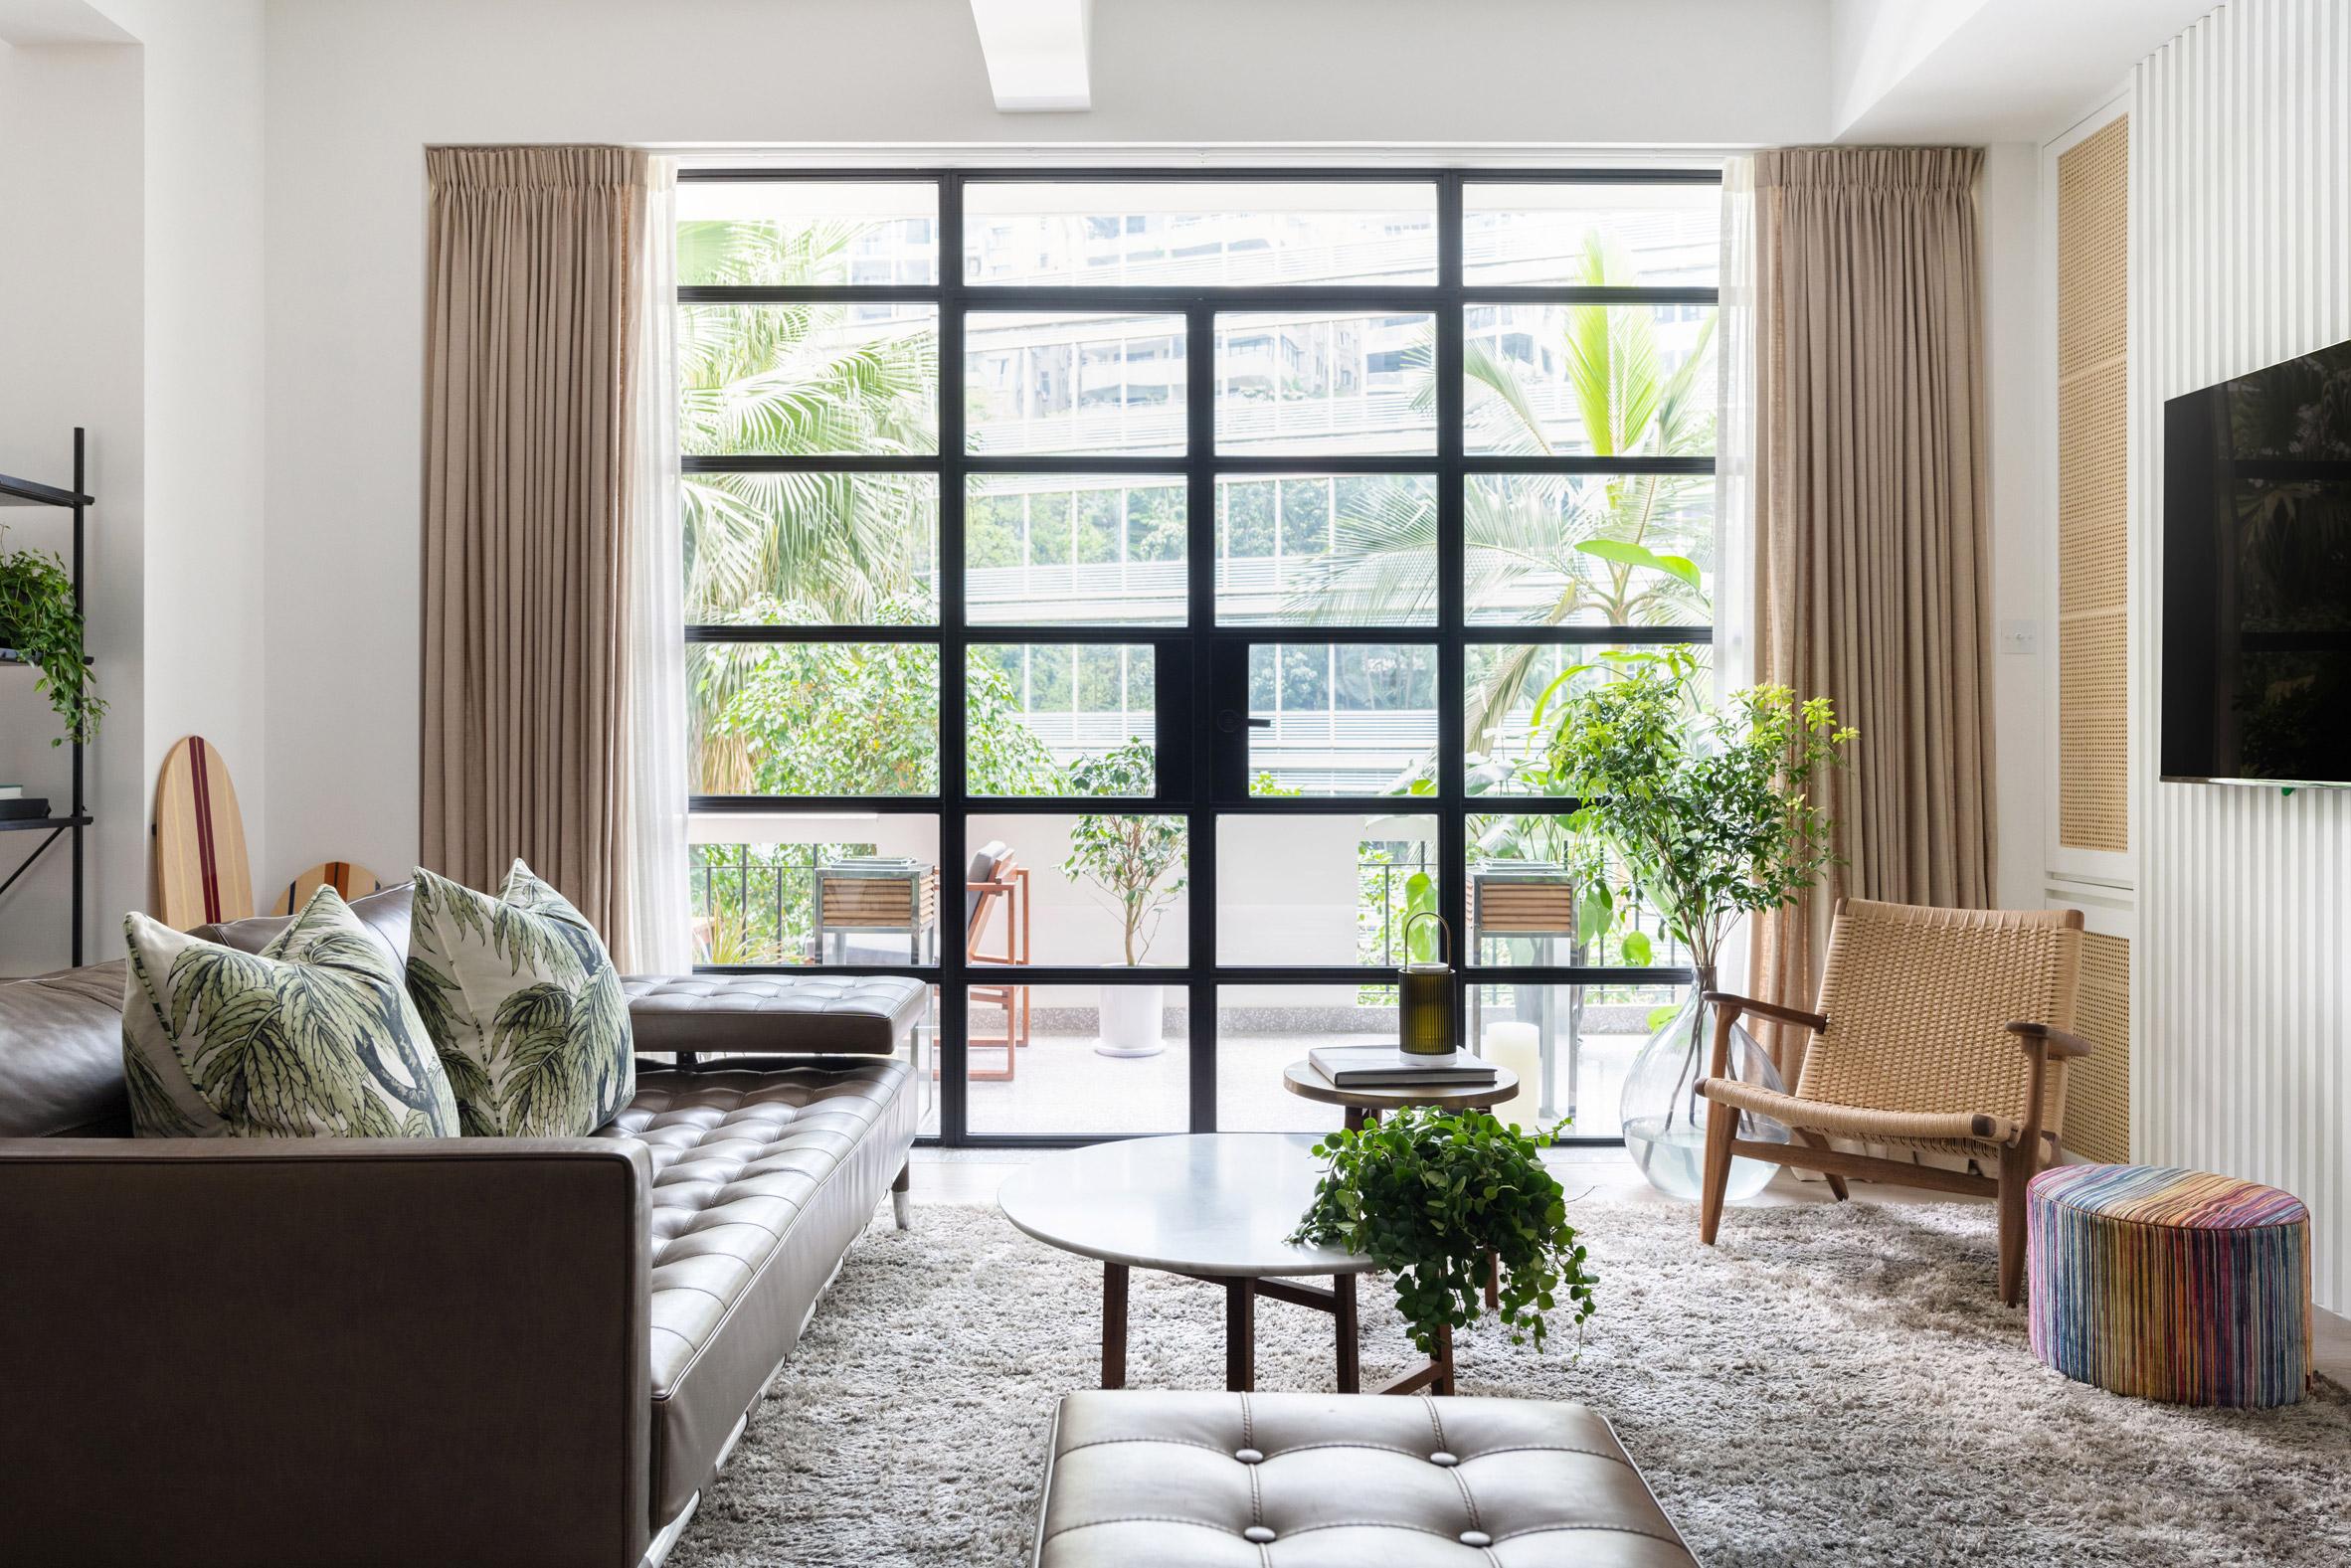 Living room with steel balcony doorway in Grosvenor Residence by Lim + Lu